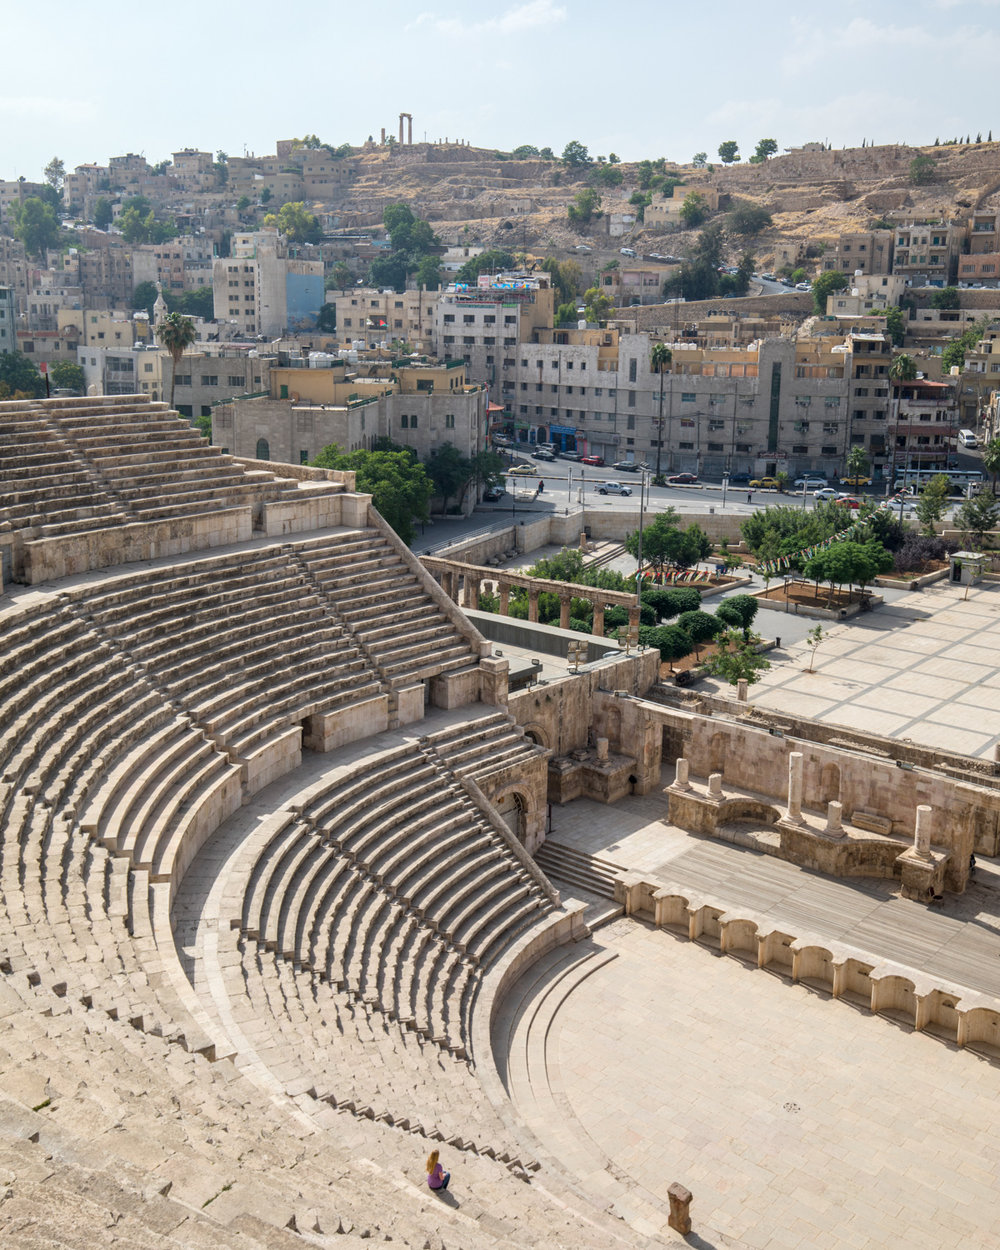 Backpacking Jordan - The Roman Amphitheatre